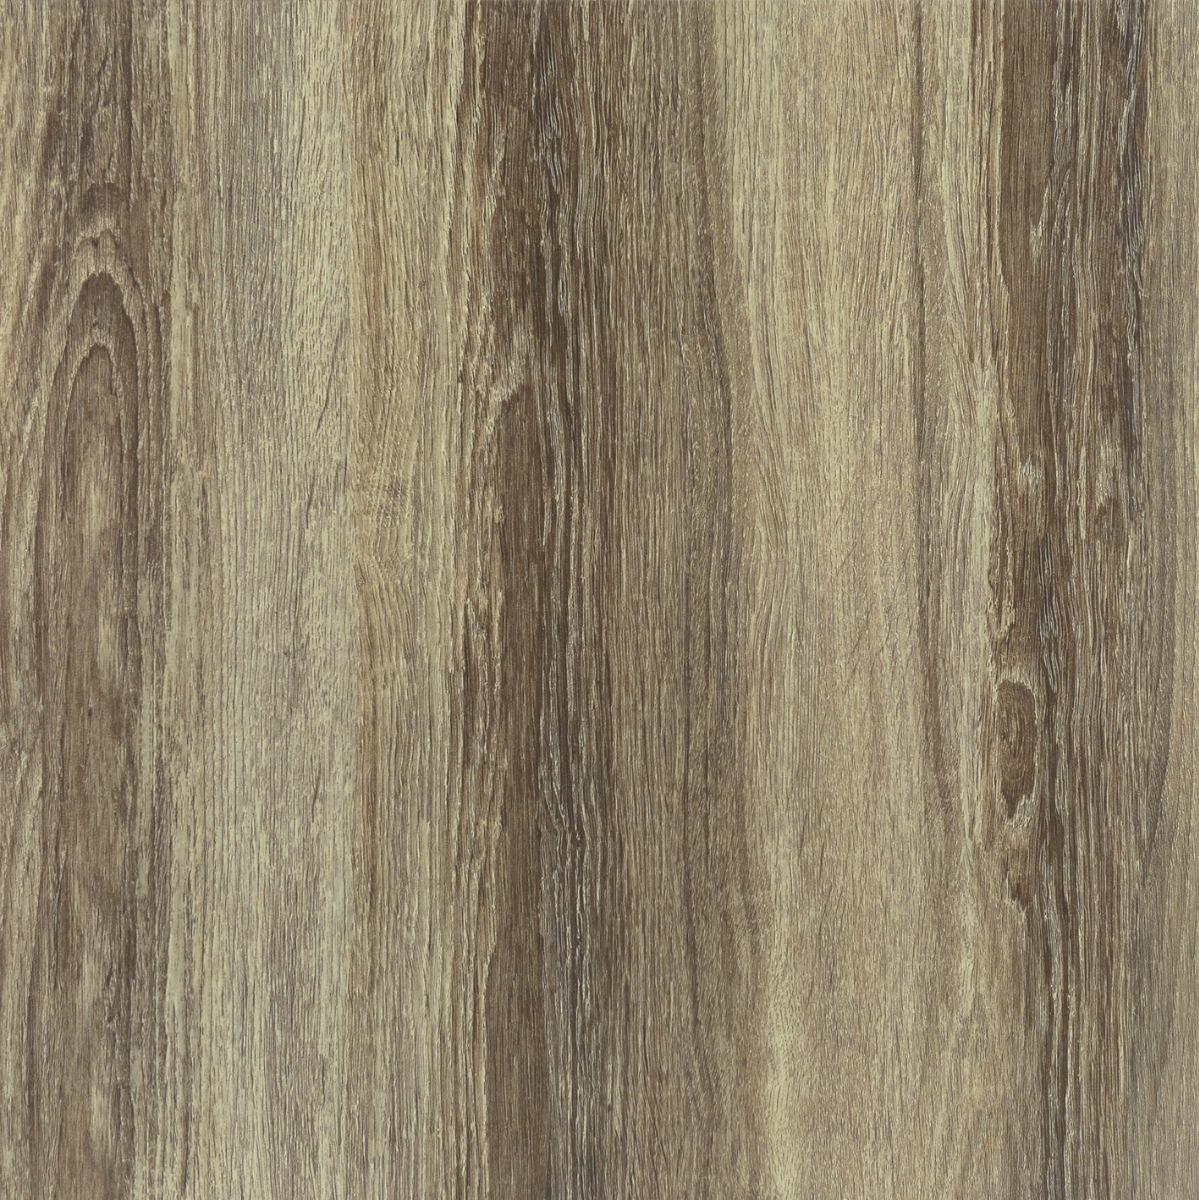 GFT BDW Walnut Wood FT